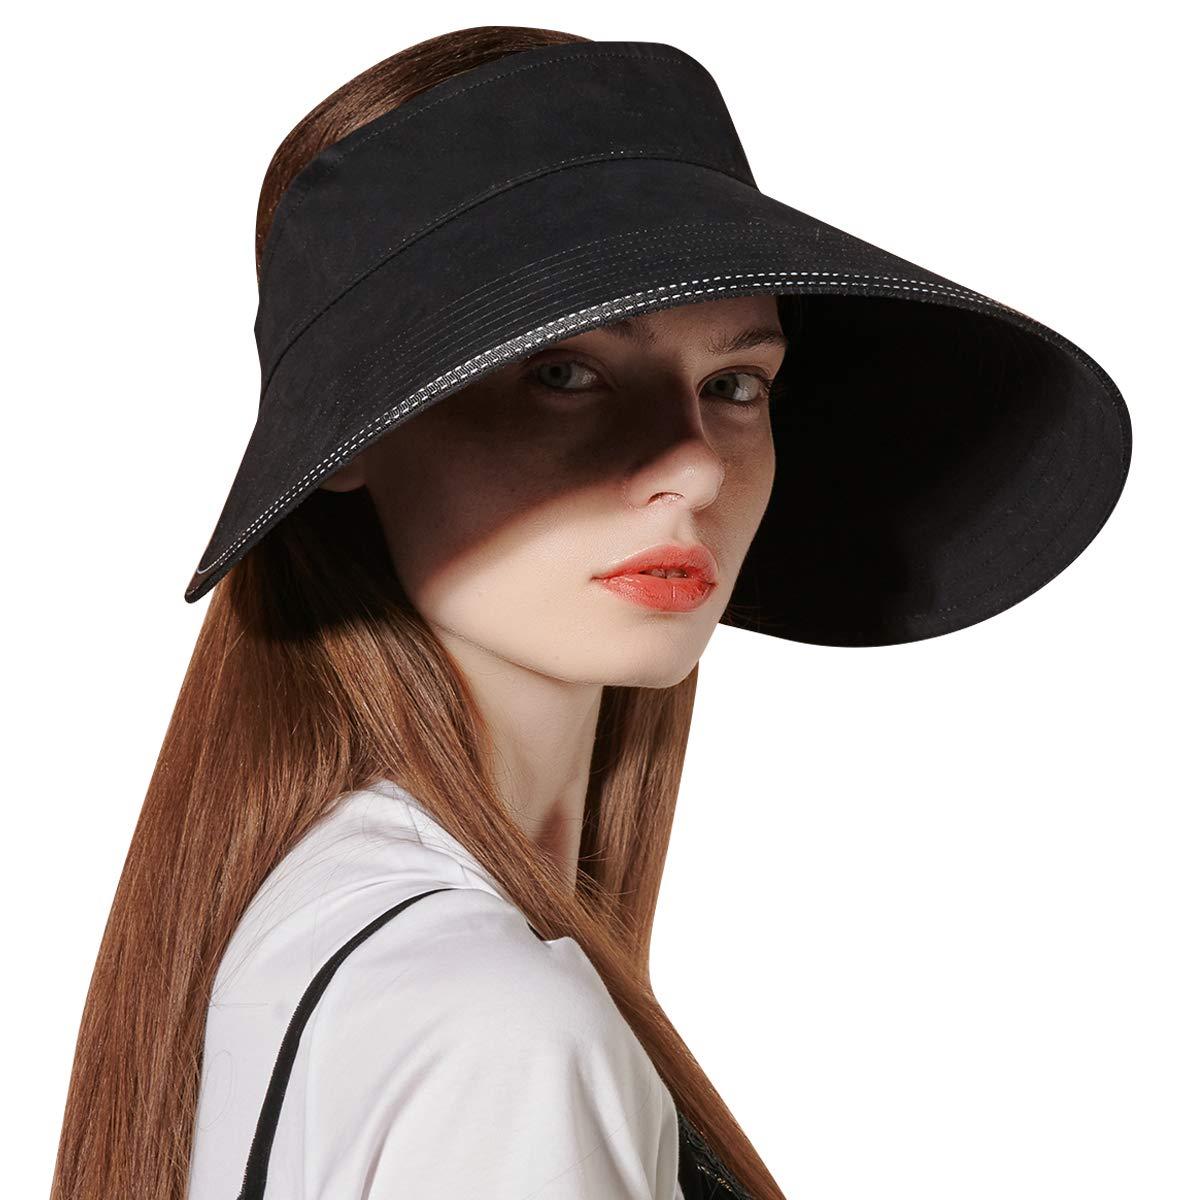 CACUSS Women's Cotton Sun Hat UPF50+ Large Brim Visor Adjustable Velcro Buckle Packable Summer Beach Cap